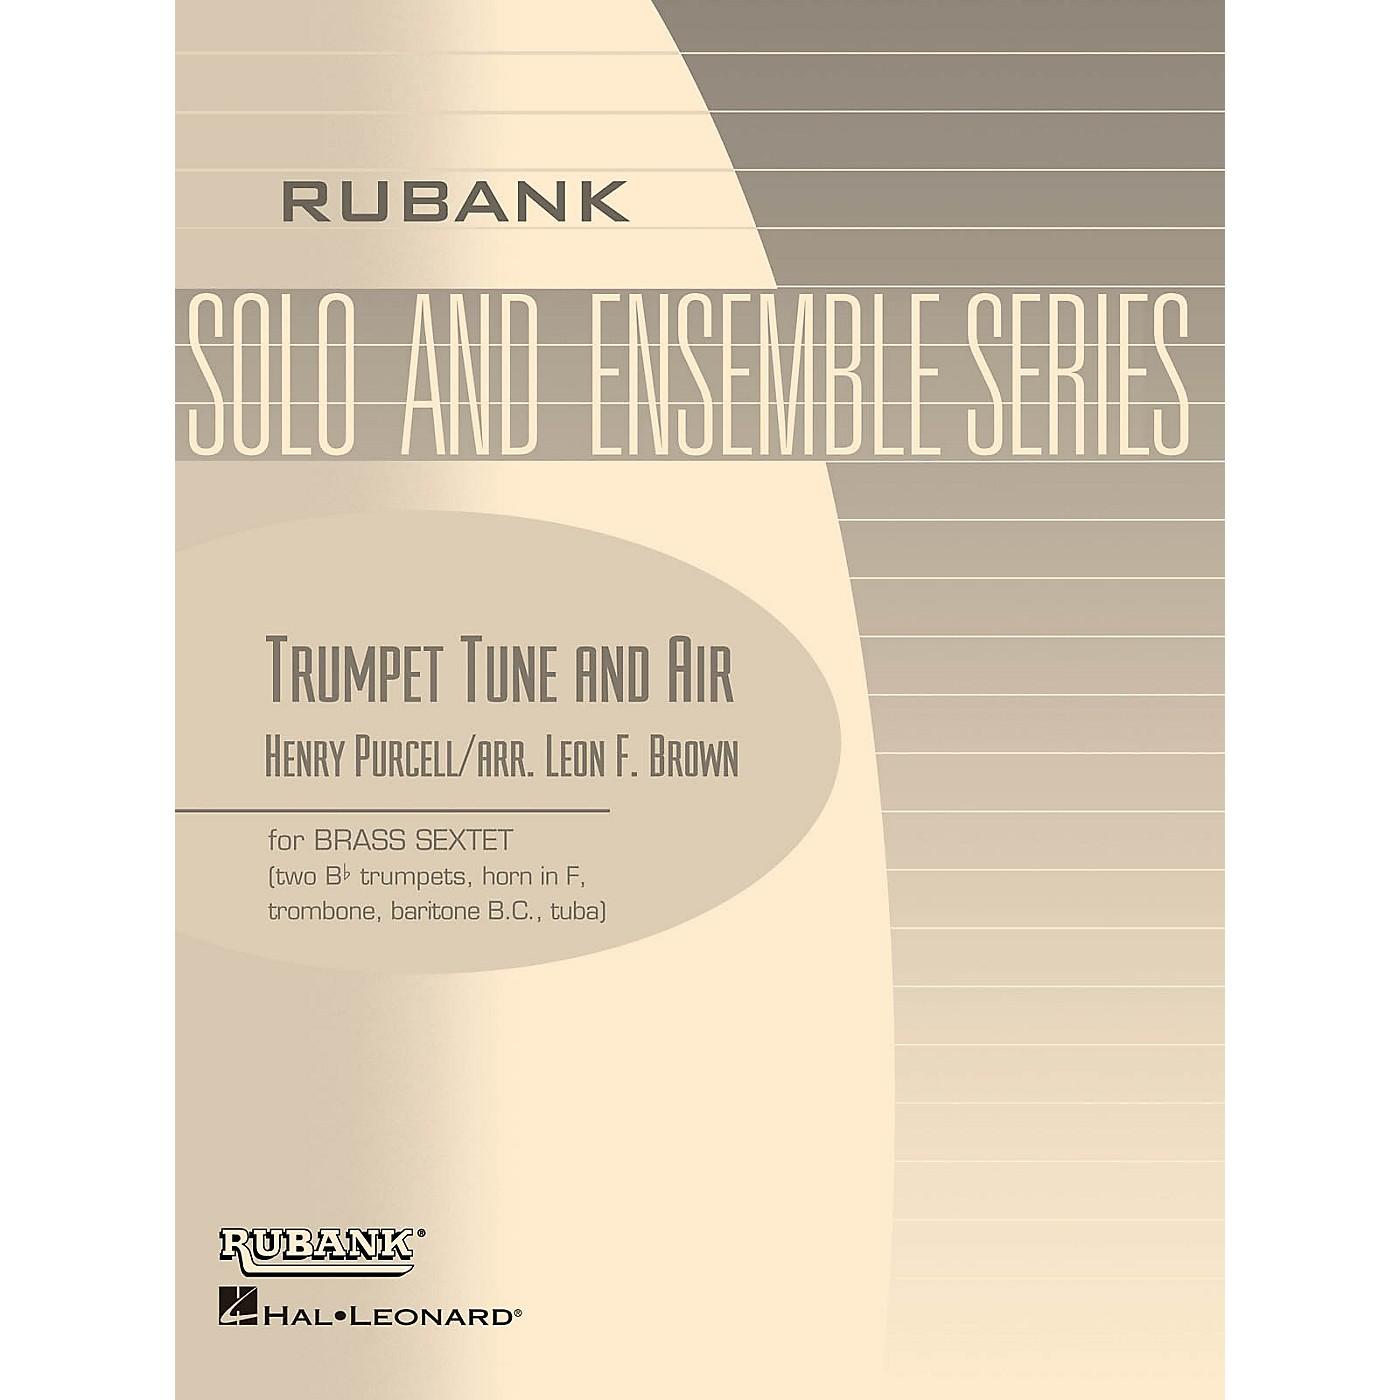 Rubank Publications Trumpet Tune and Air (Brass Sextet - Grade 2) Rubank Solo/Ensemble Sheet Series thumbnail